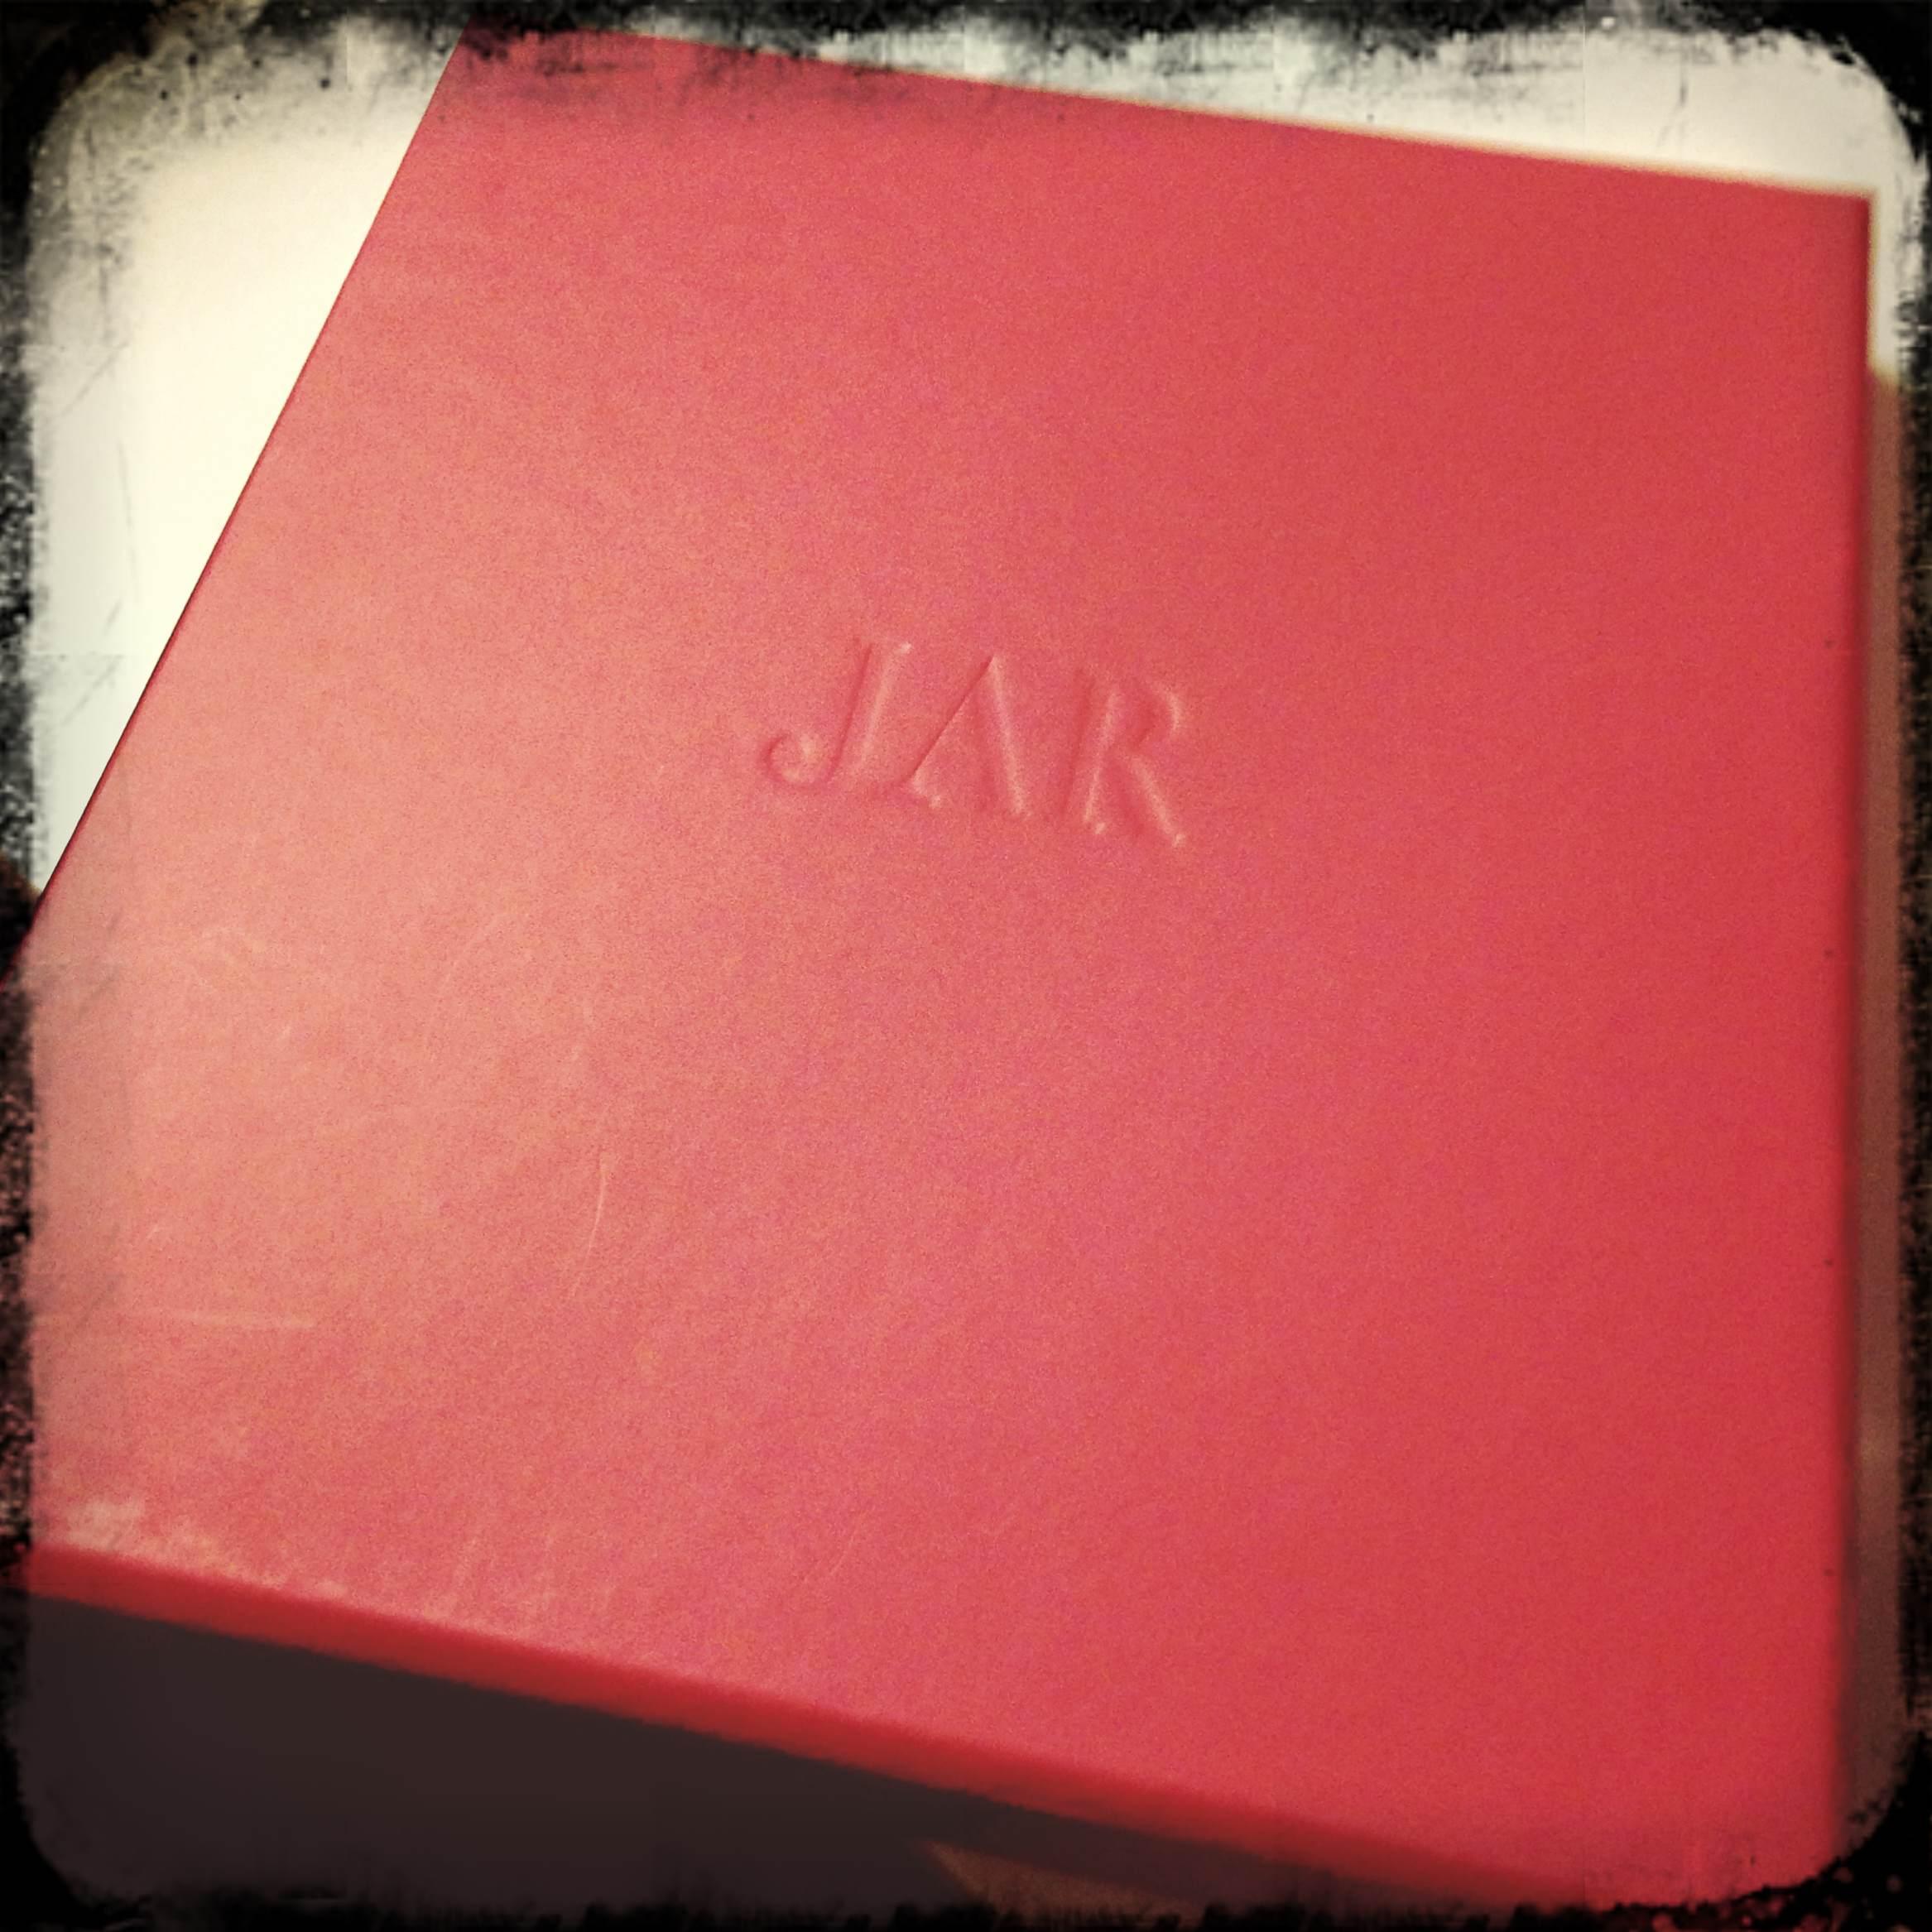 JAR book from the MET exhibition.